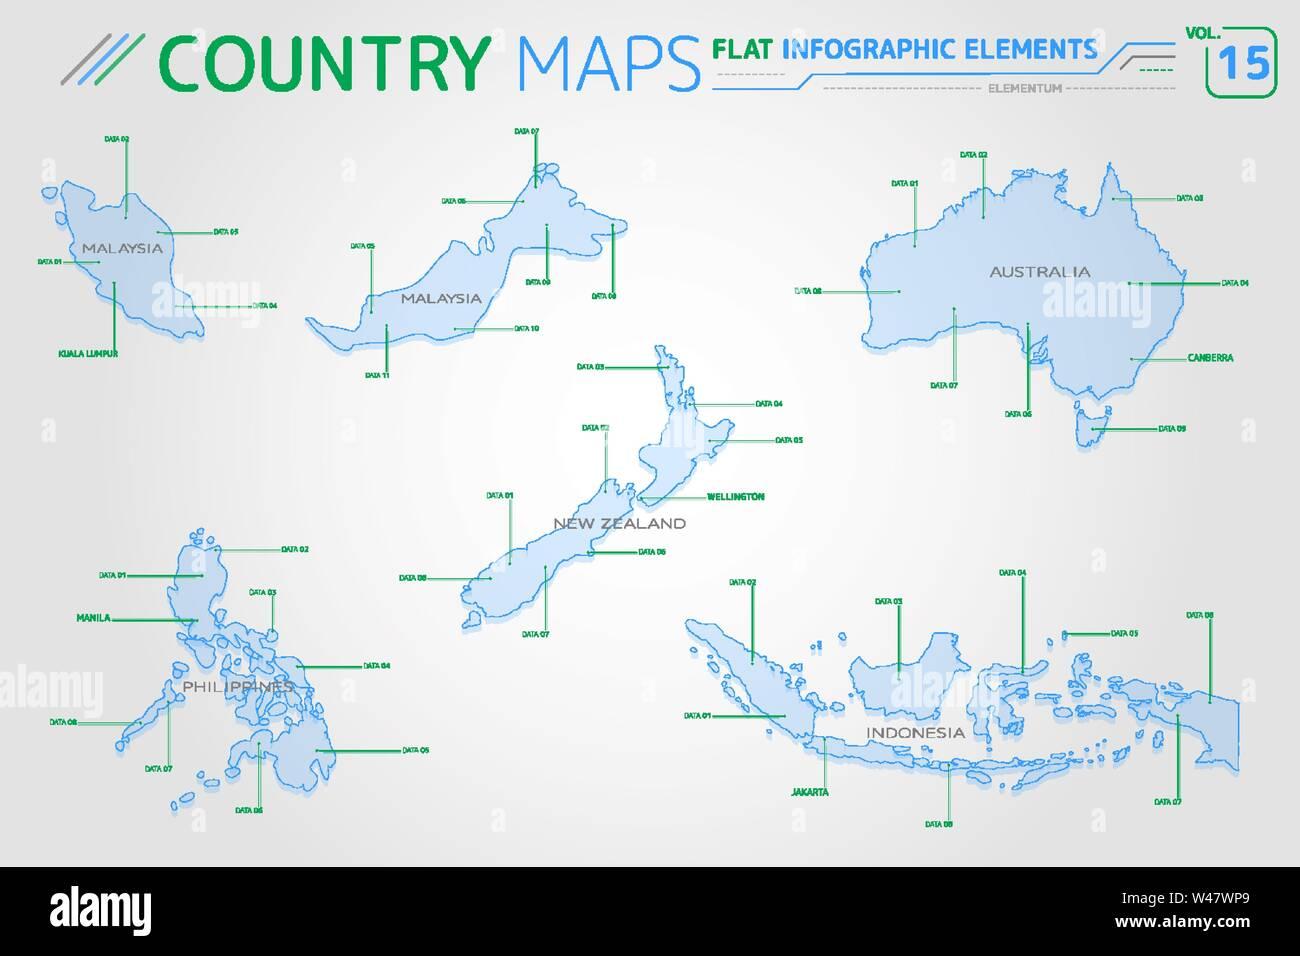 Malaysia Indonesia Australia New Zealand And Philippines